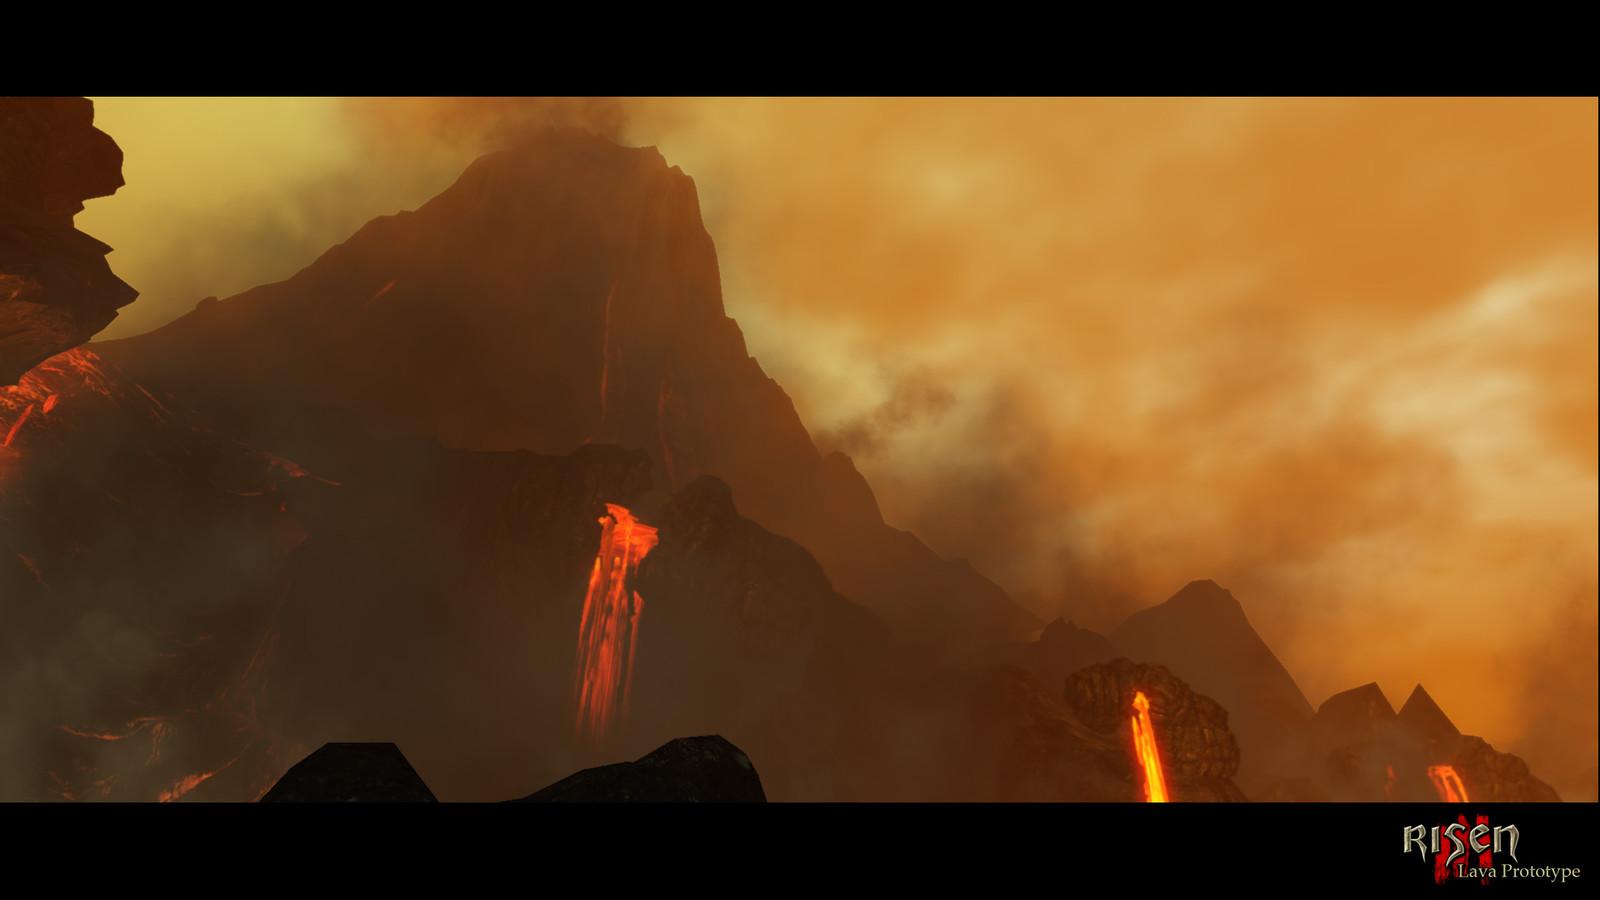 Risen 3 Lava Prototype (2012)